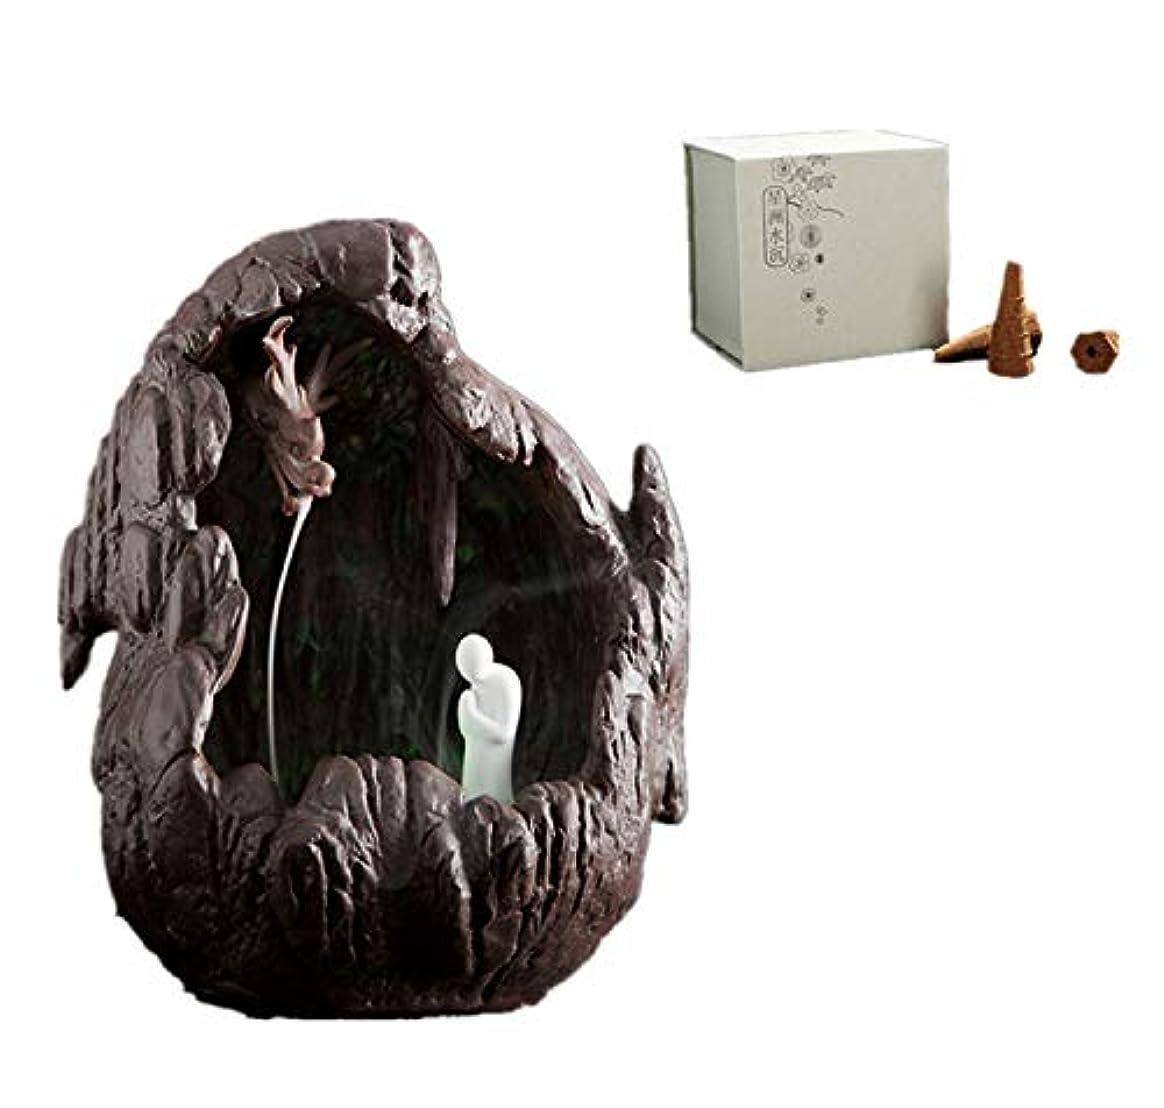 XPPXPP Reflux Incense Burner, Ceramic Incense Burner, With 40pcs Reflux Cone, Suitable For Home Decoration